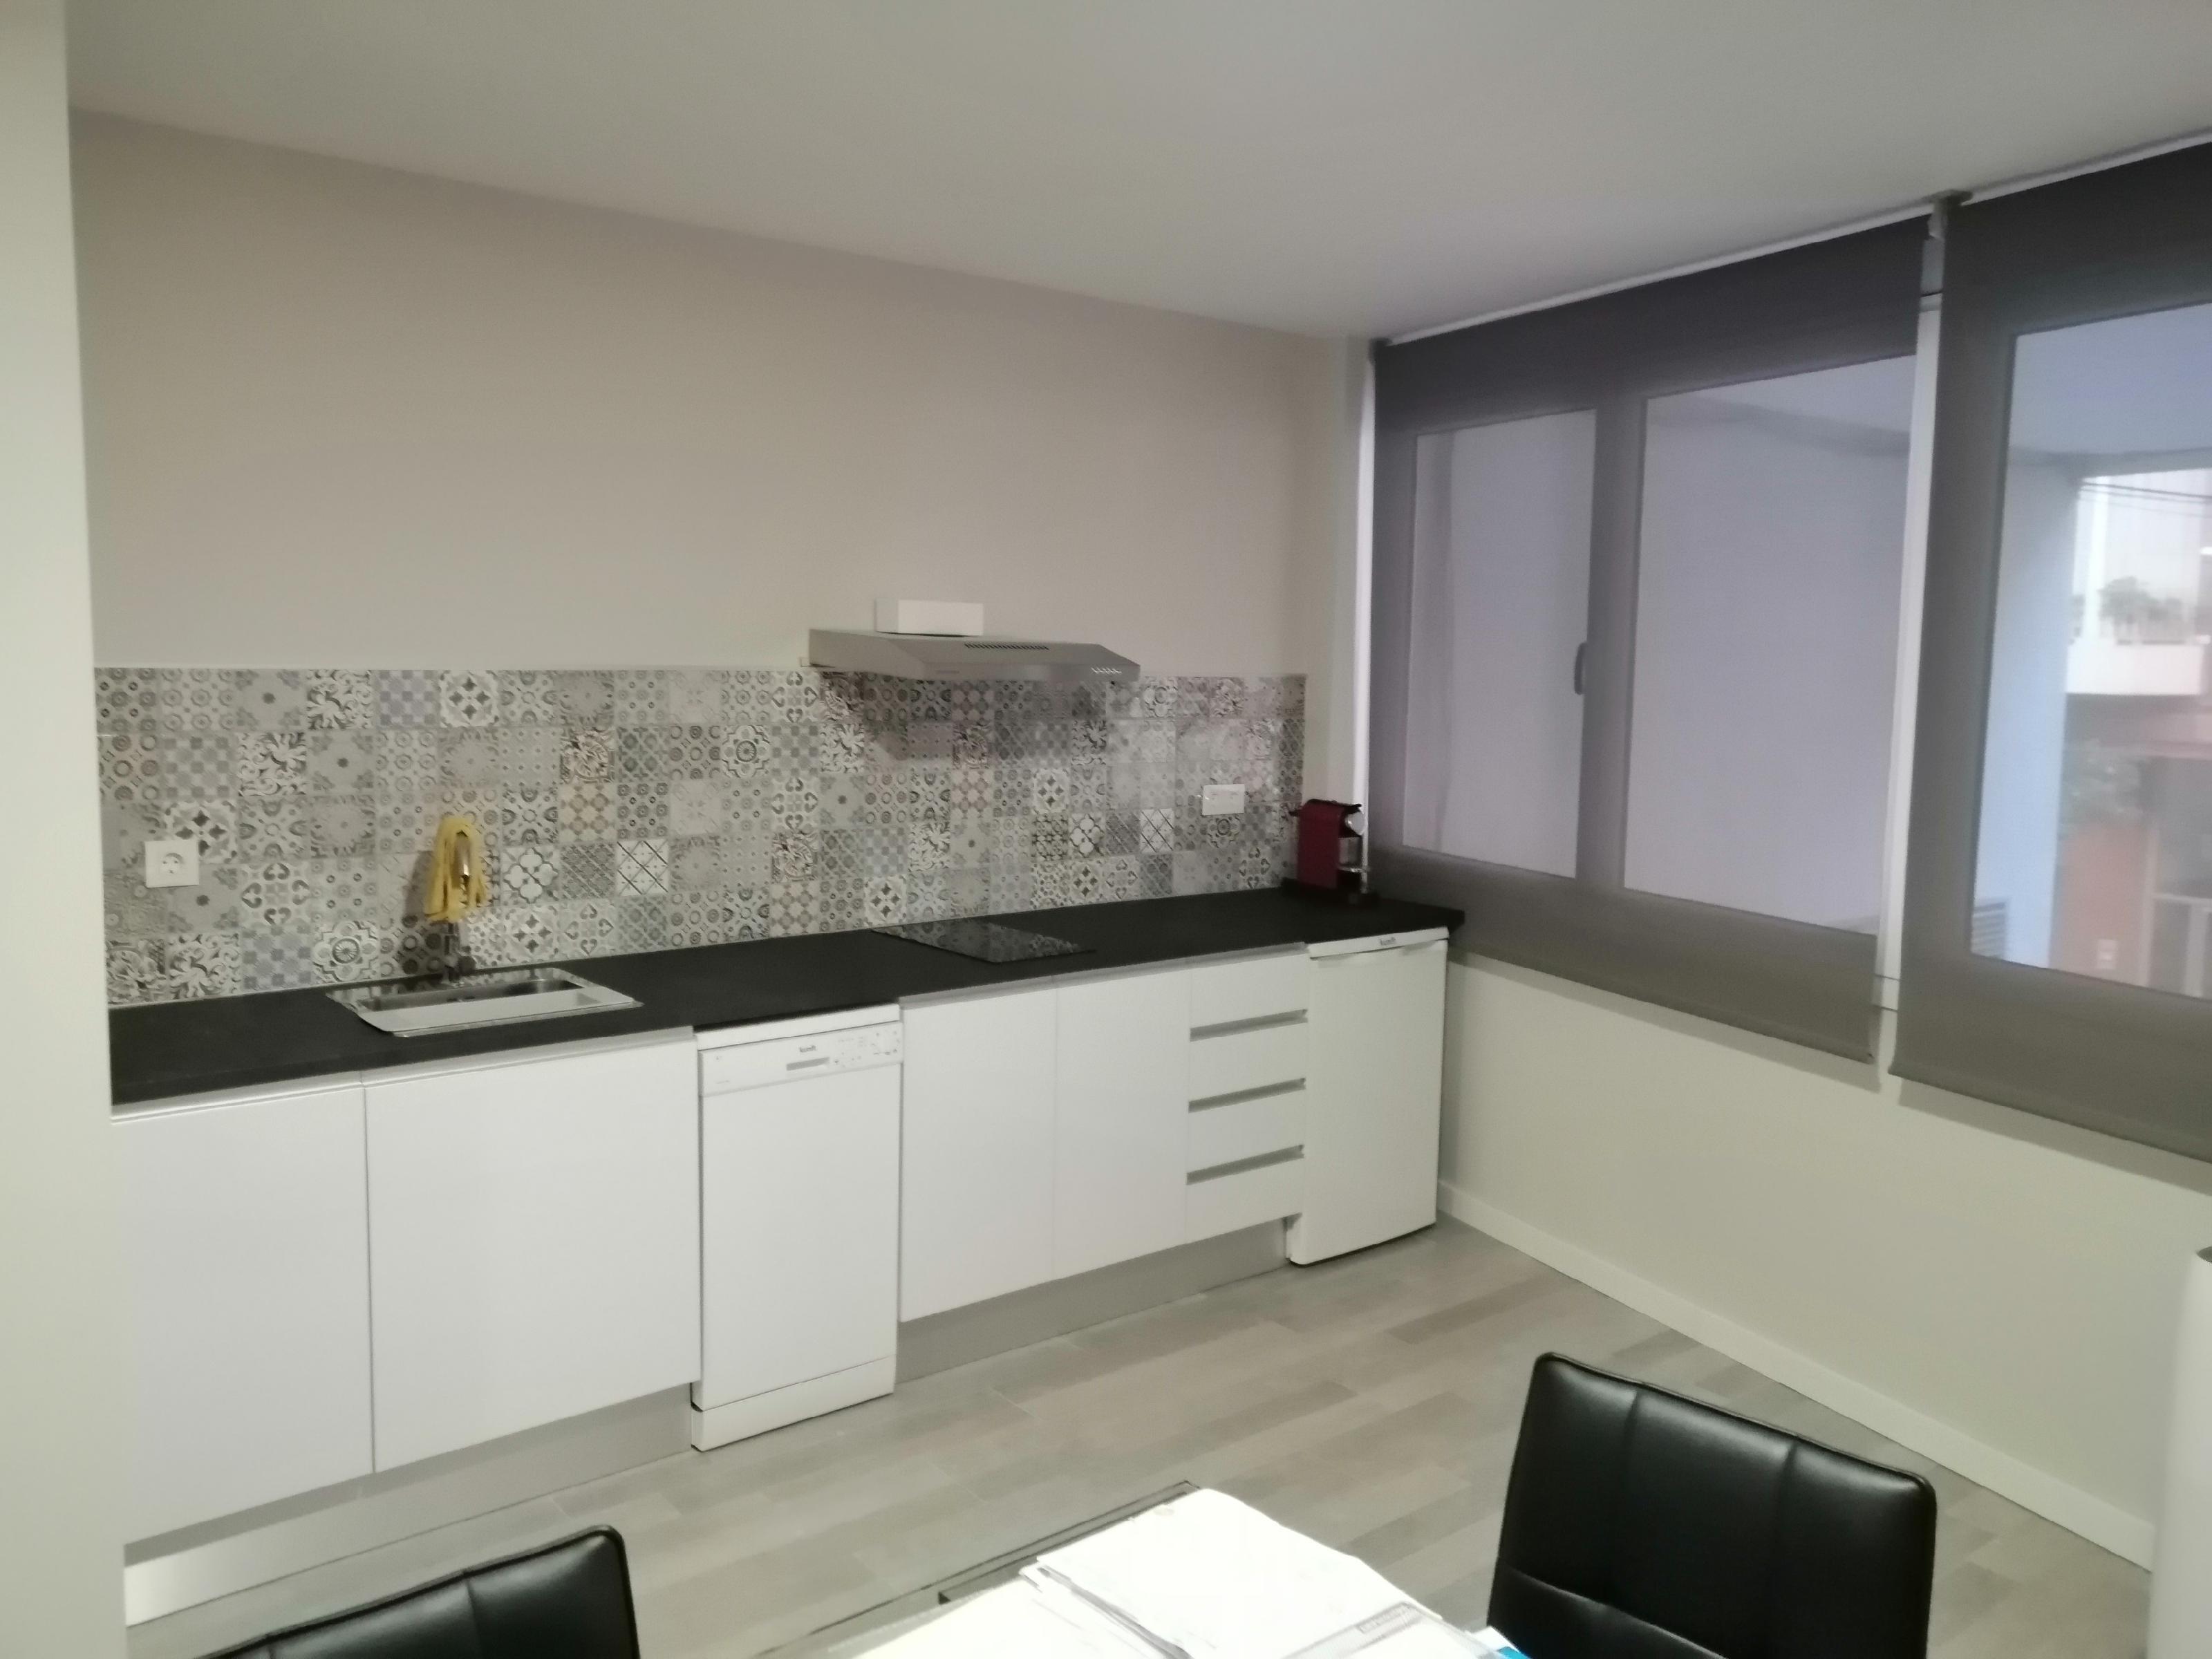 Imagen 2 Oficina Comercial en alquiler en Esplugues De Llobregat / Can Clota junto Anselmo Clave